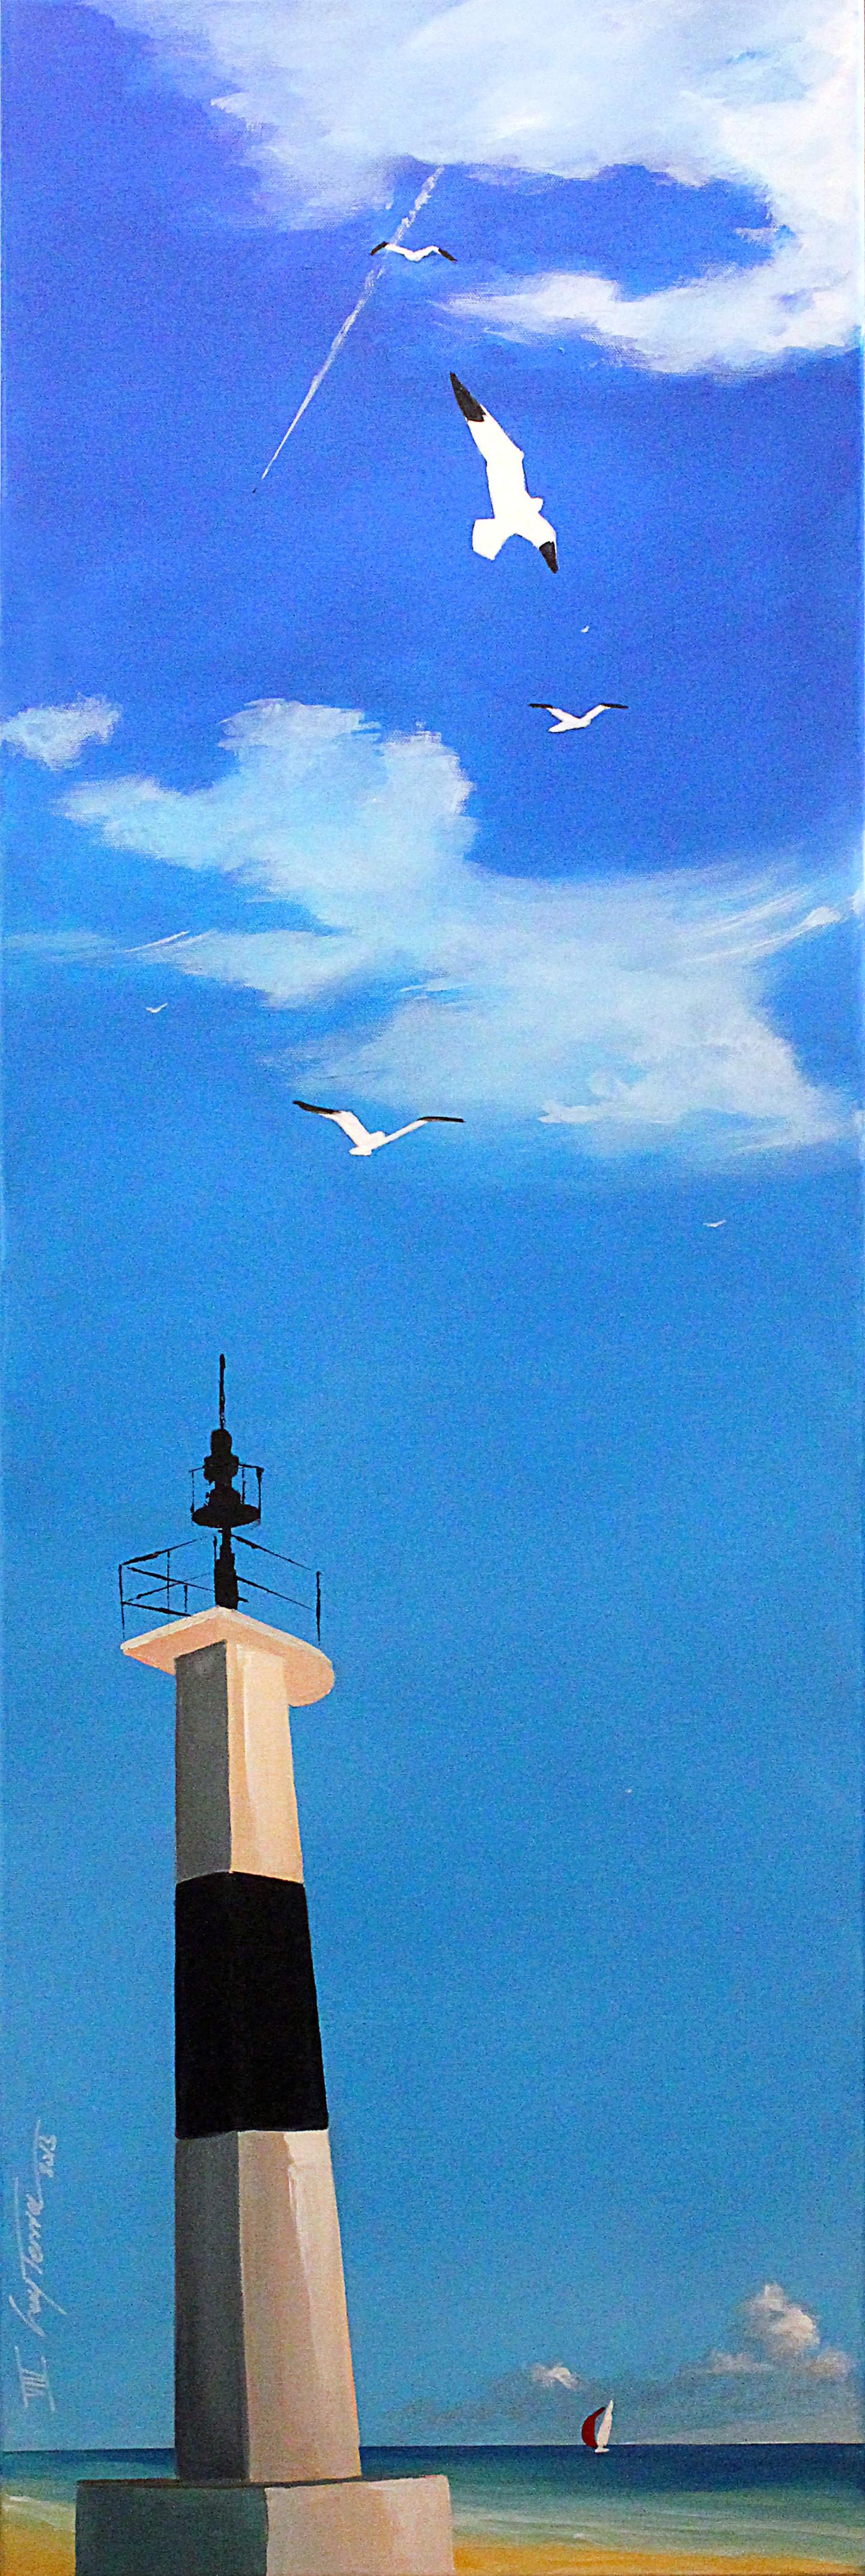 Guy Terrier - Quiberon, la bougie